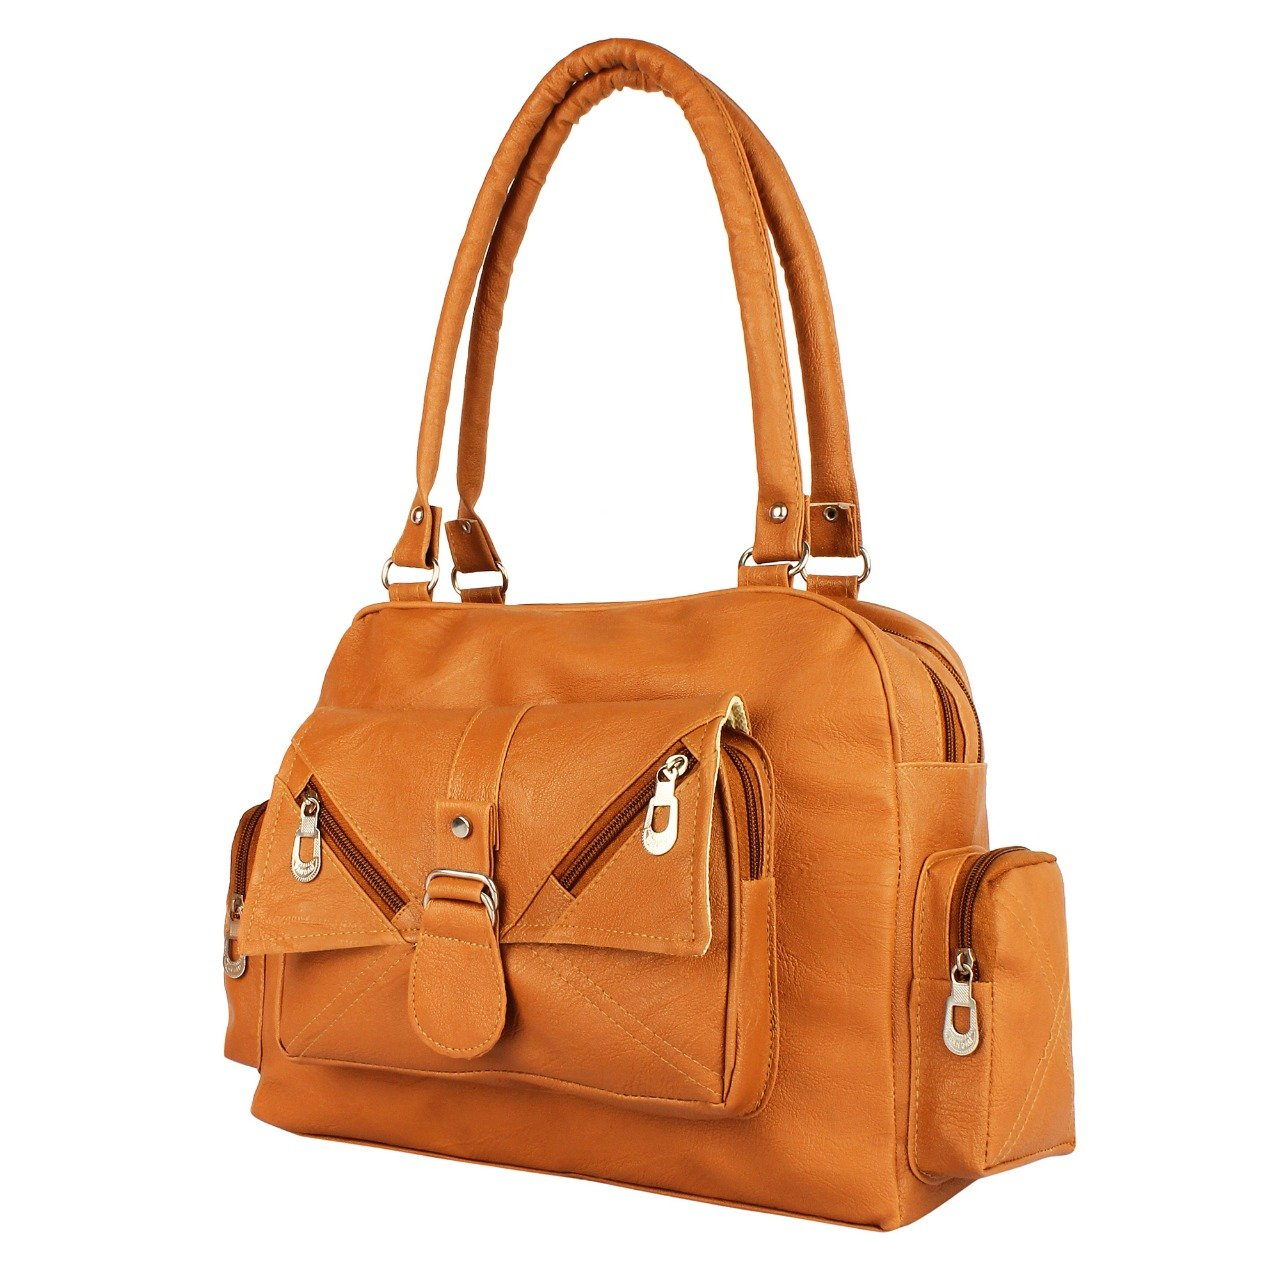 3a36532600 REYAZ JAIBUN TAN SHOULDER BAG FOR WOMEN  Amazon.in  Shoes   Handbags